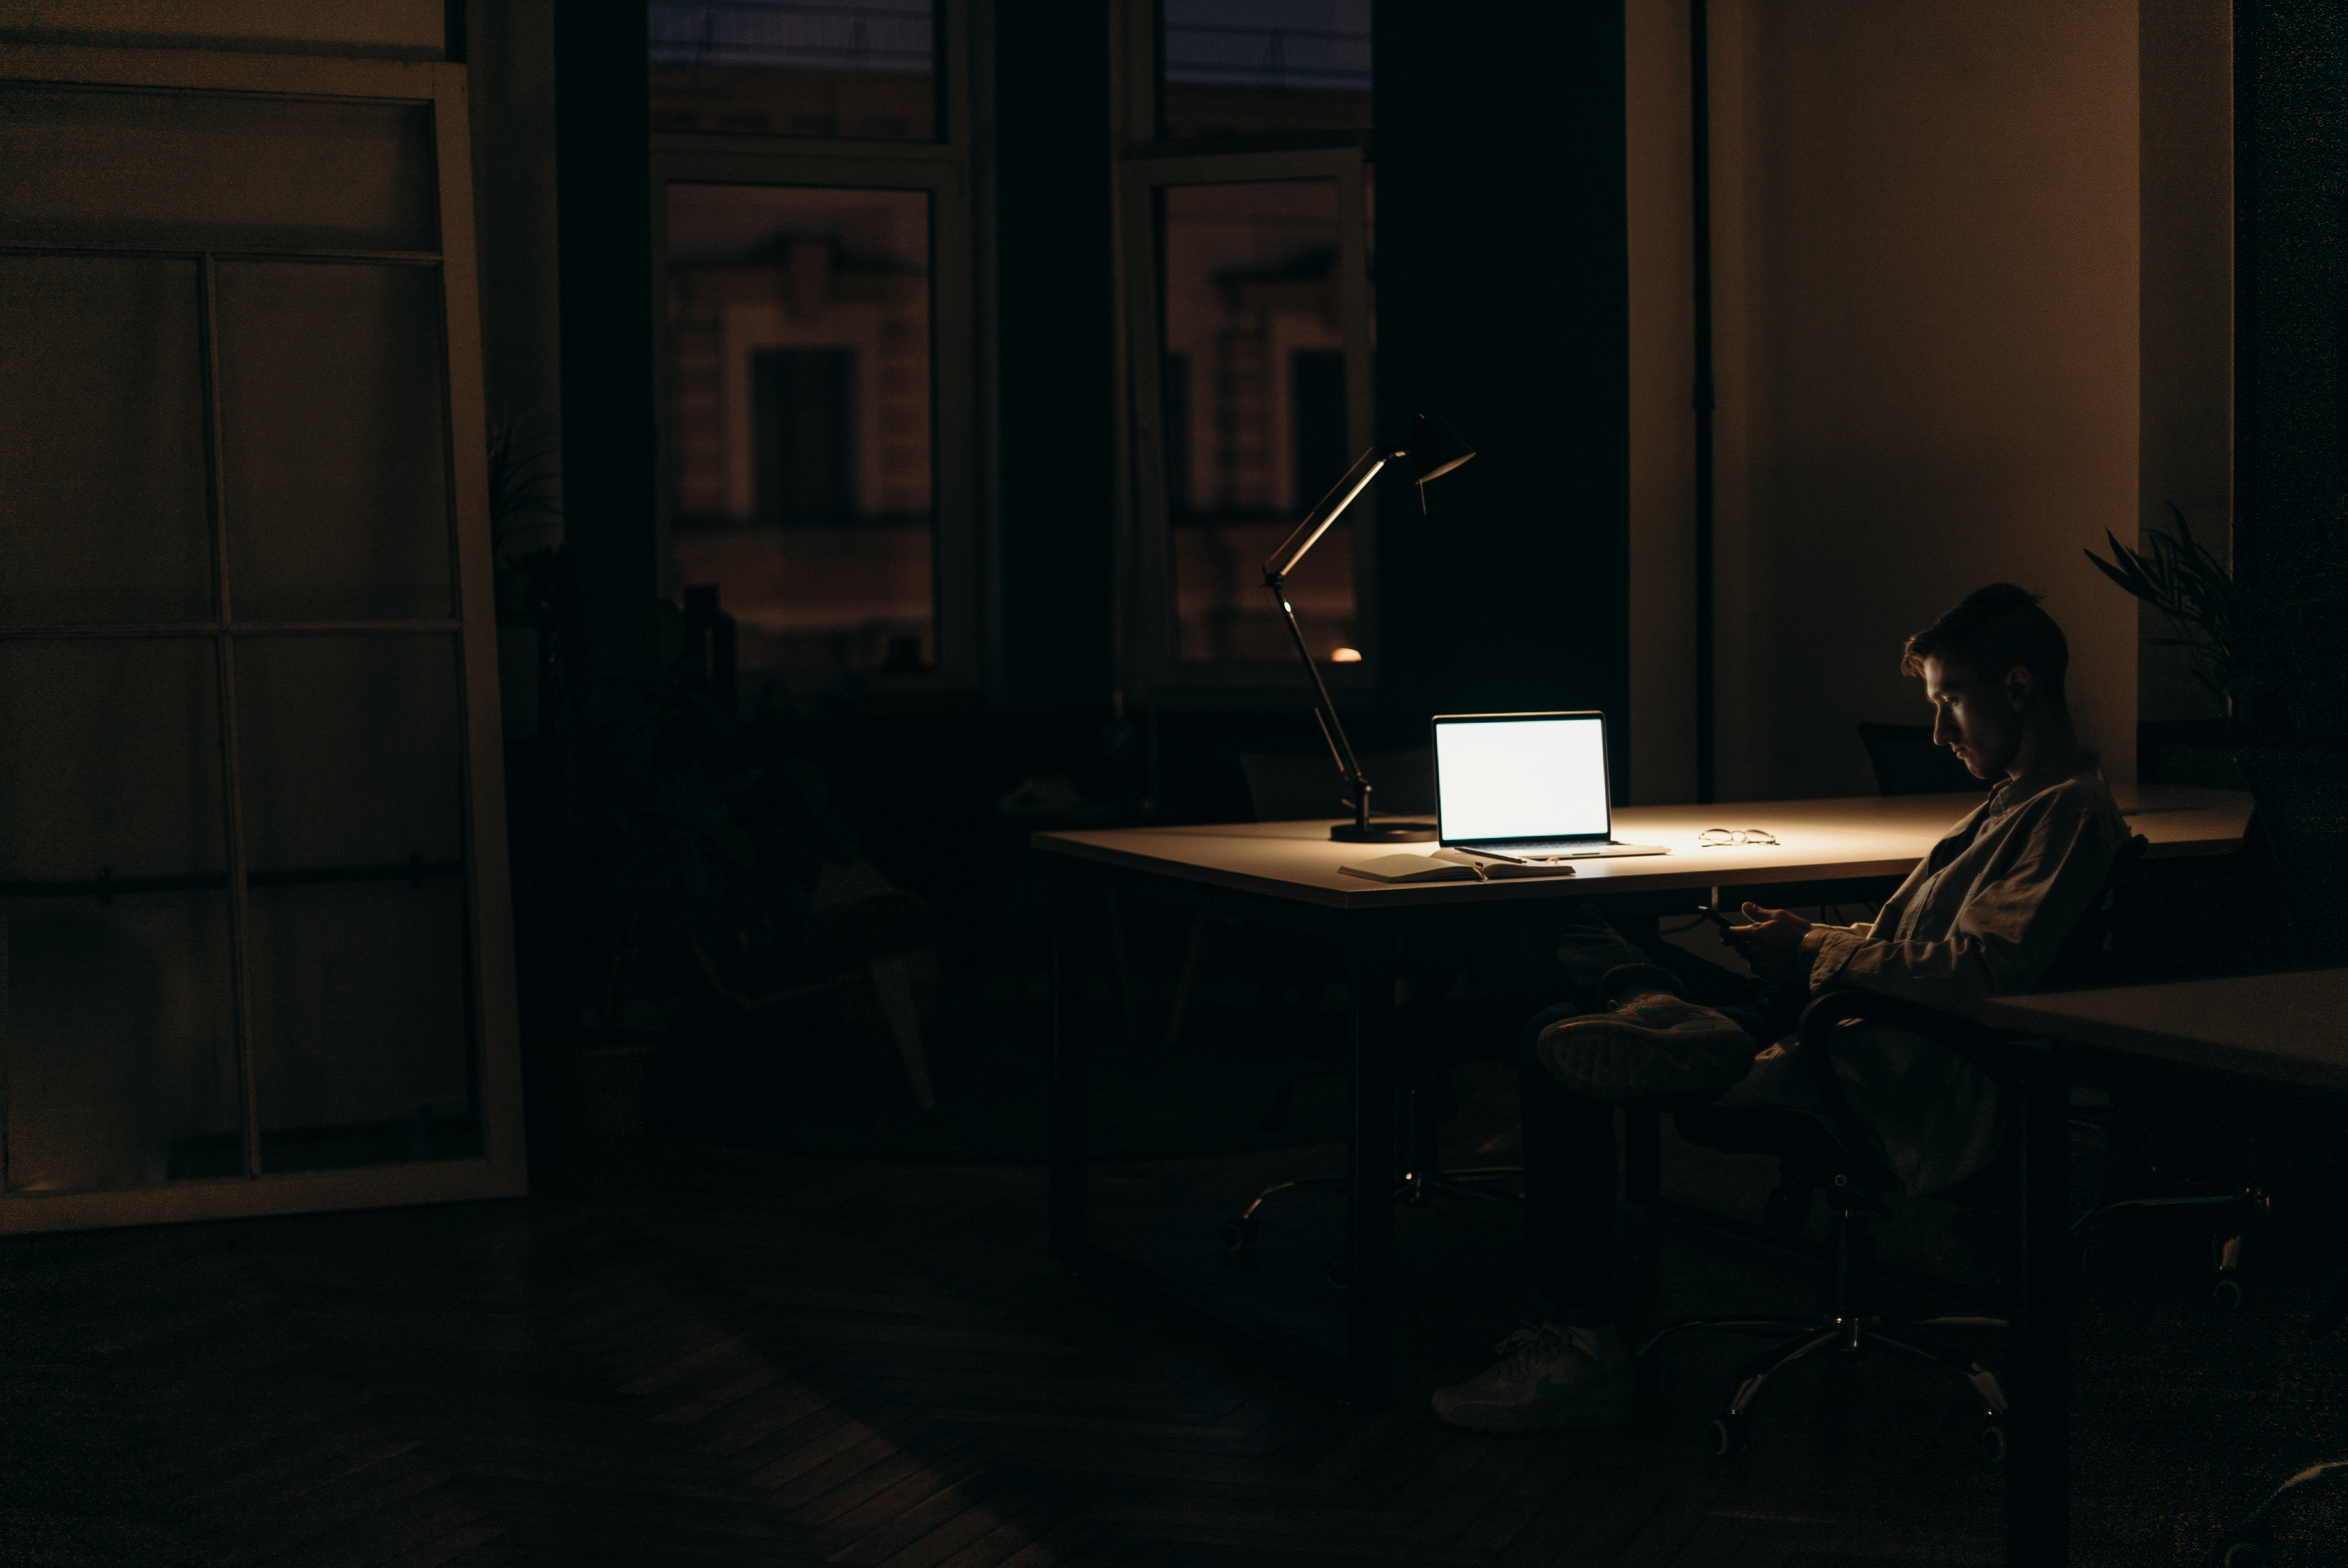 Man sitting in dark room with laptop